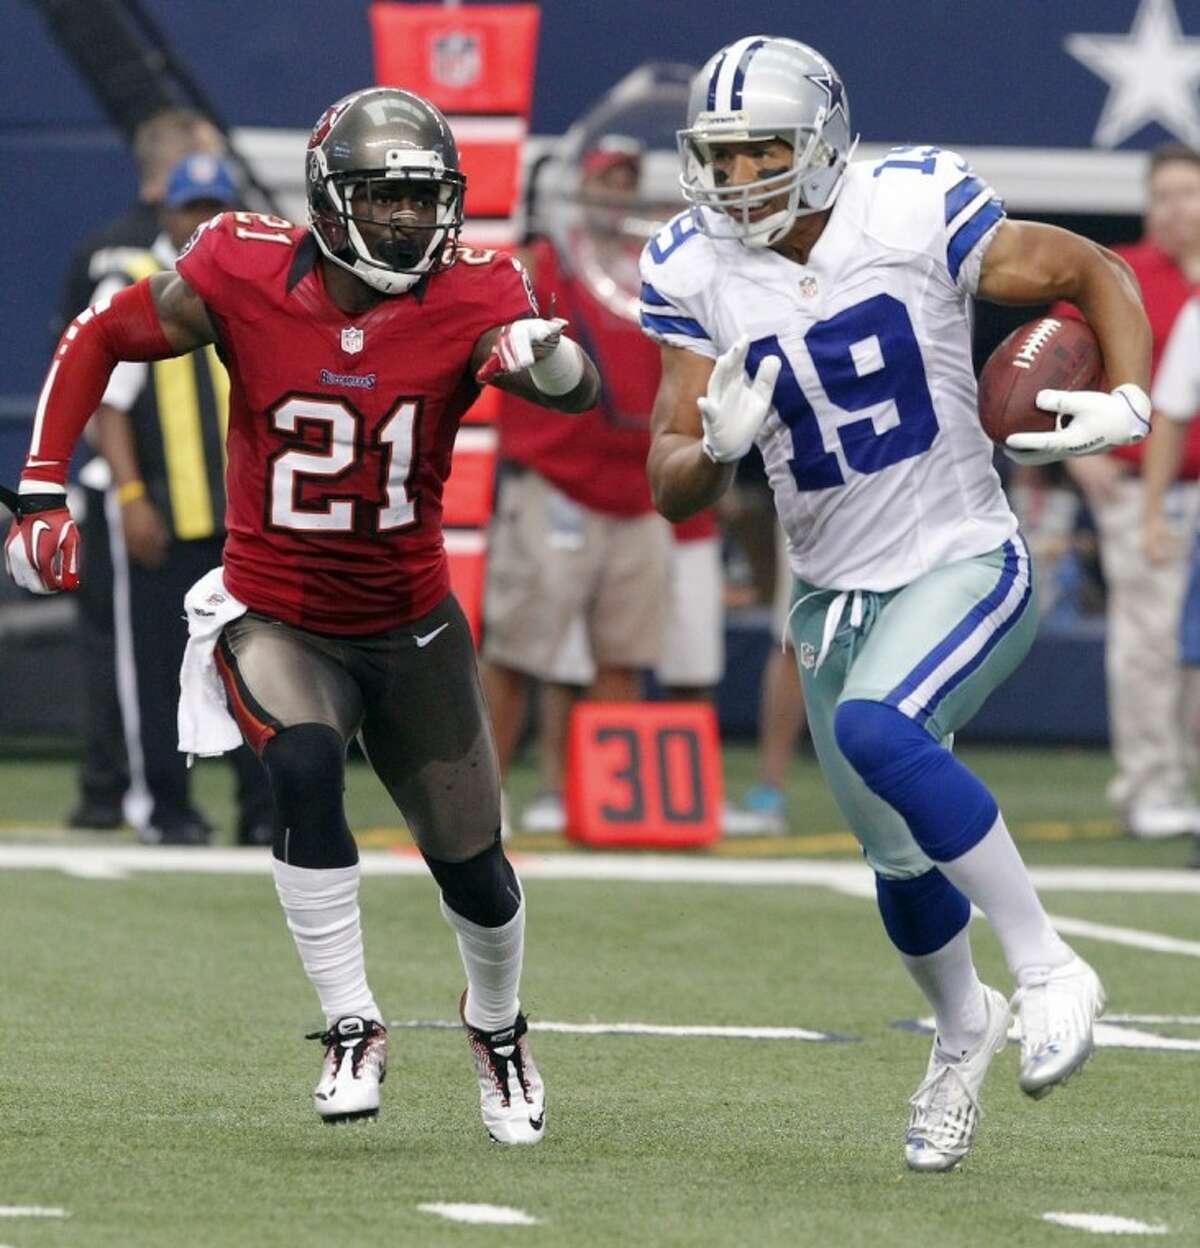 Dallas Cowboys wide receiver Miles Austin runs past Bucs cornerback Eric Wright in the second half. The Cowboys won 16-10.